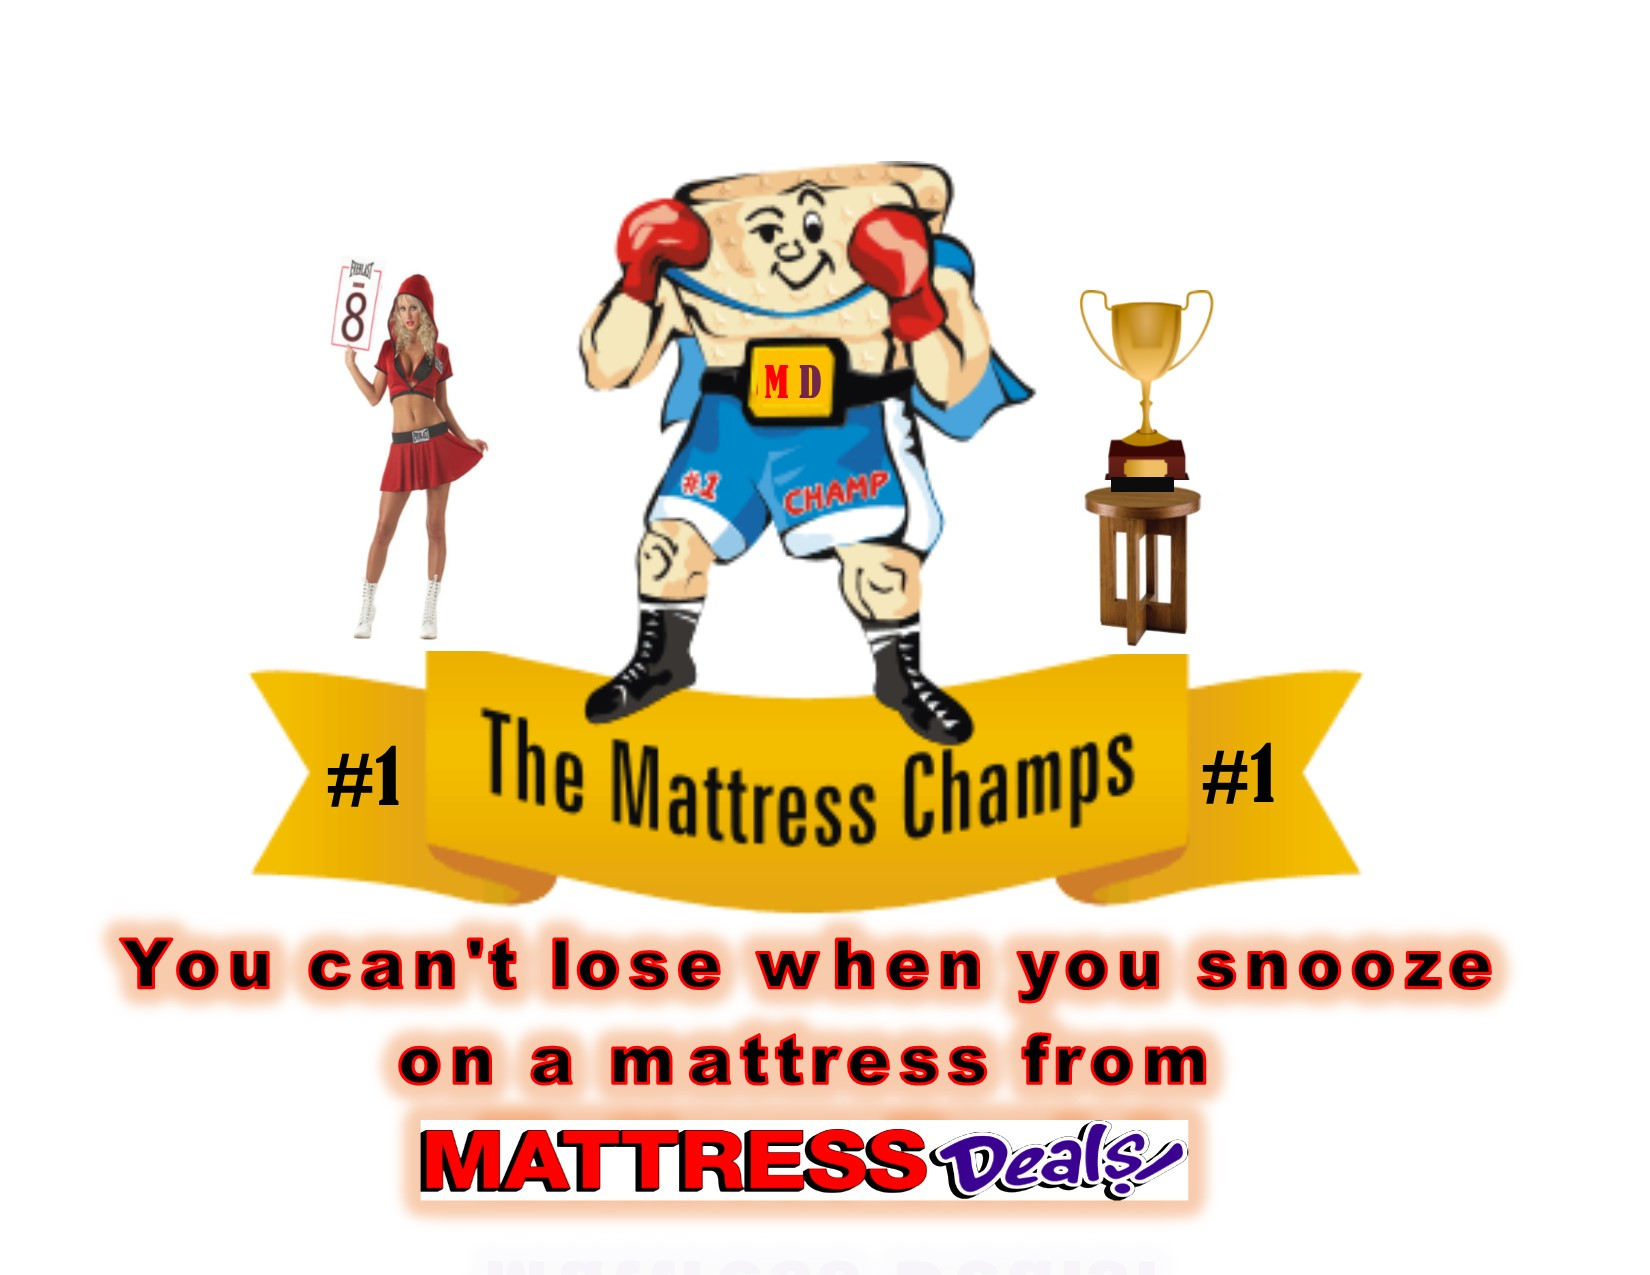 Mattress deals north charleston south carolina sc for Mattress deals